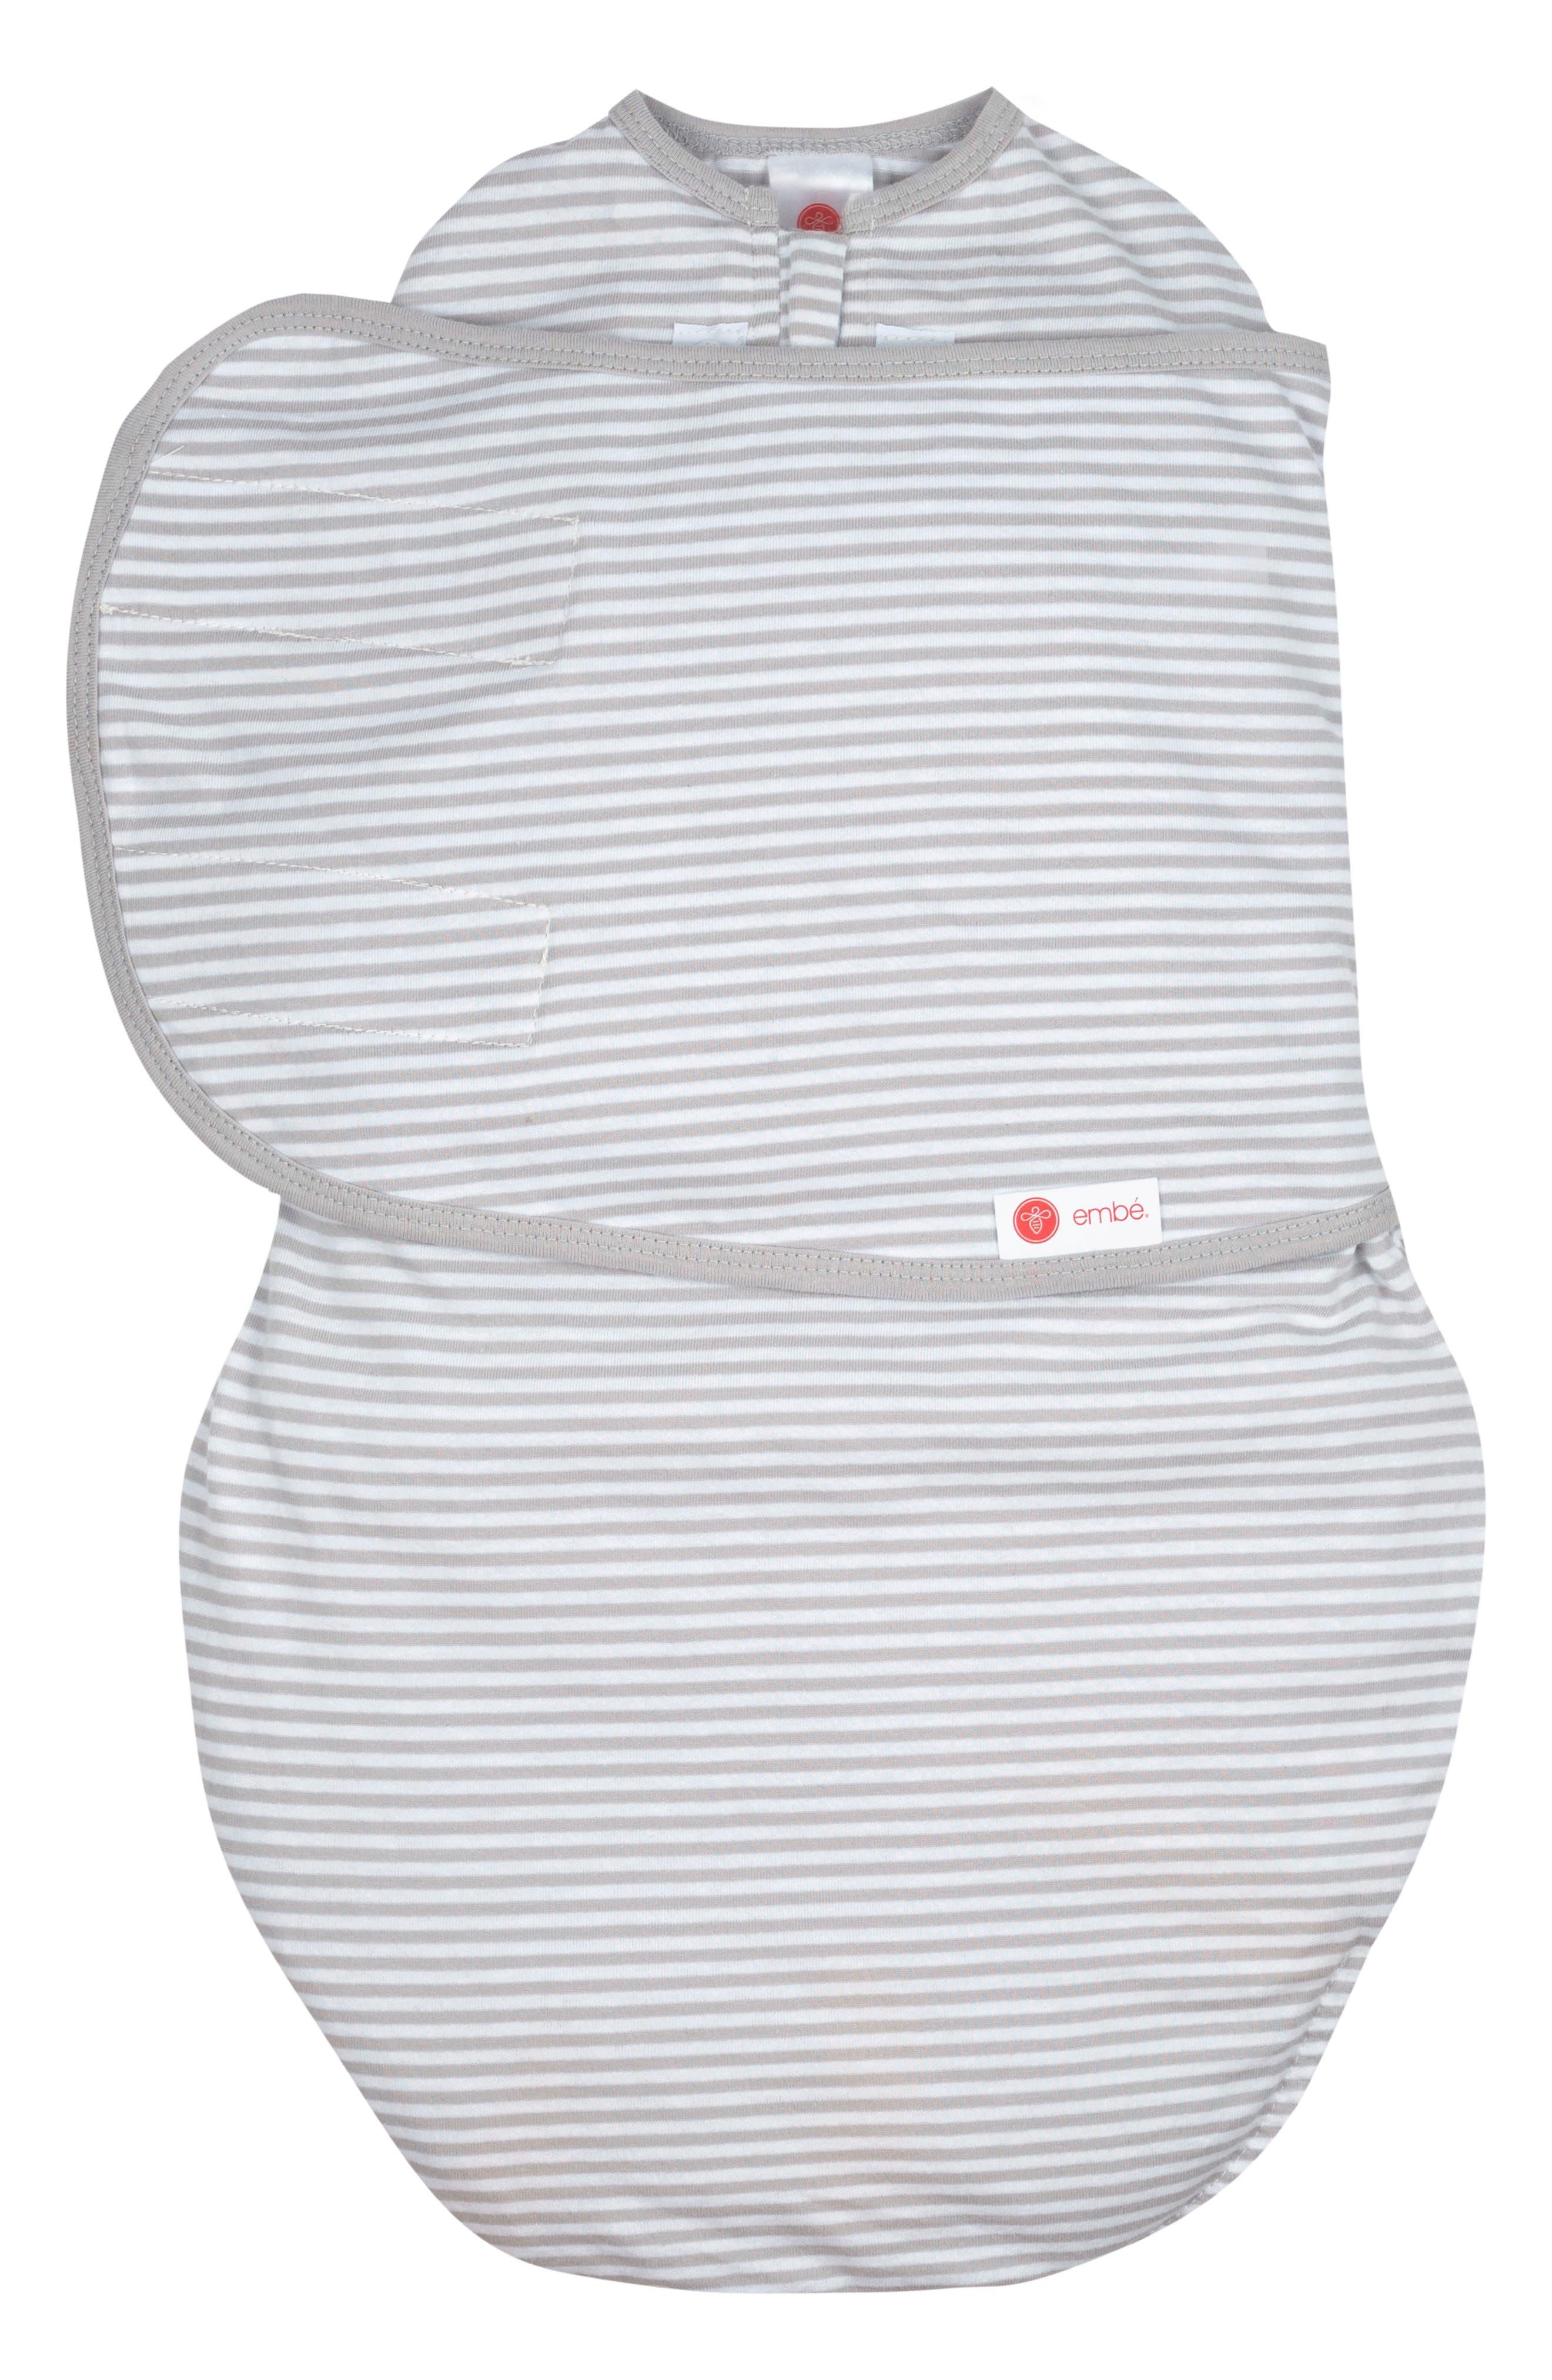 2-Way Swaddle,                         Main,                         color, Grey Stripe